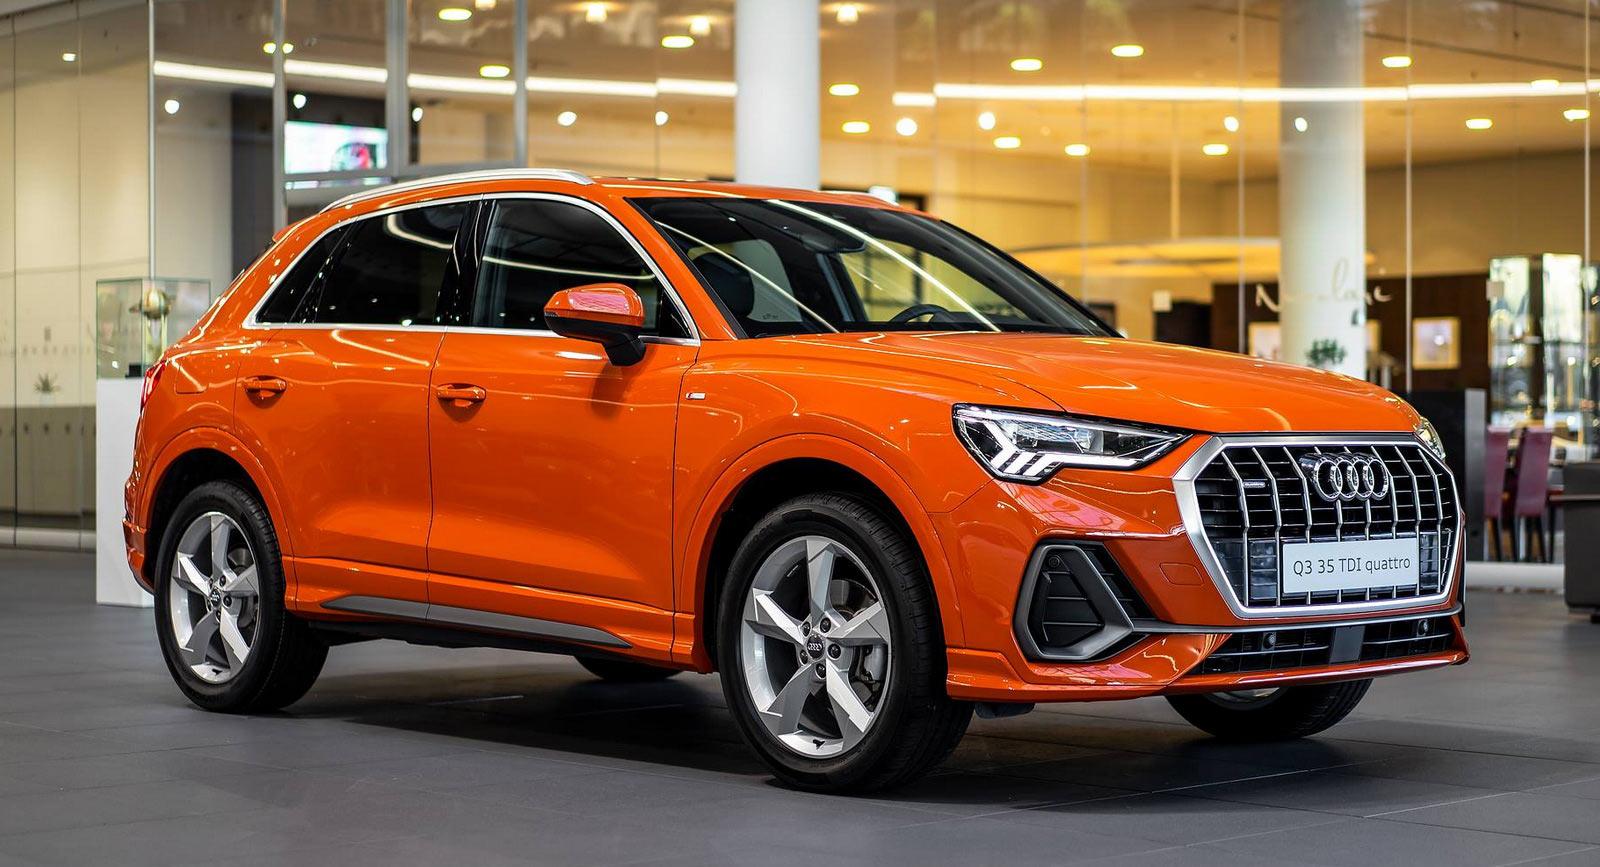 pulse orange audi q3 sports a colorful alcantara interior